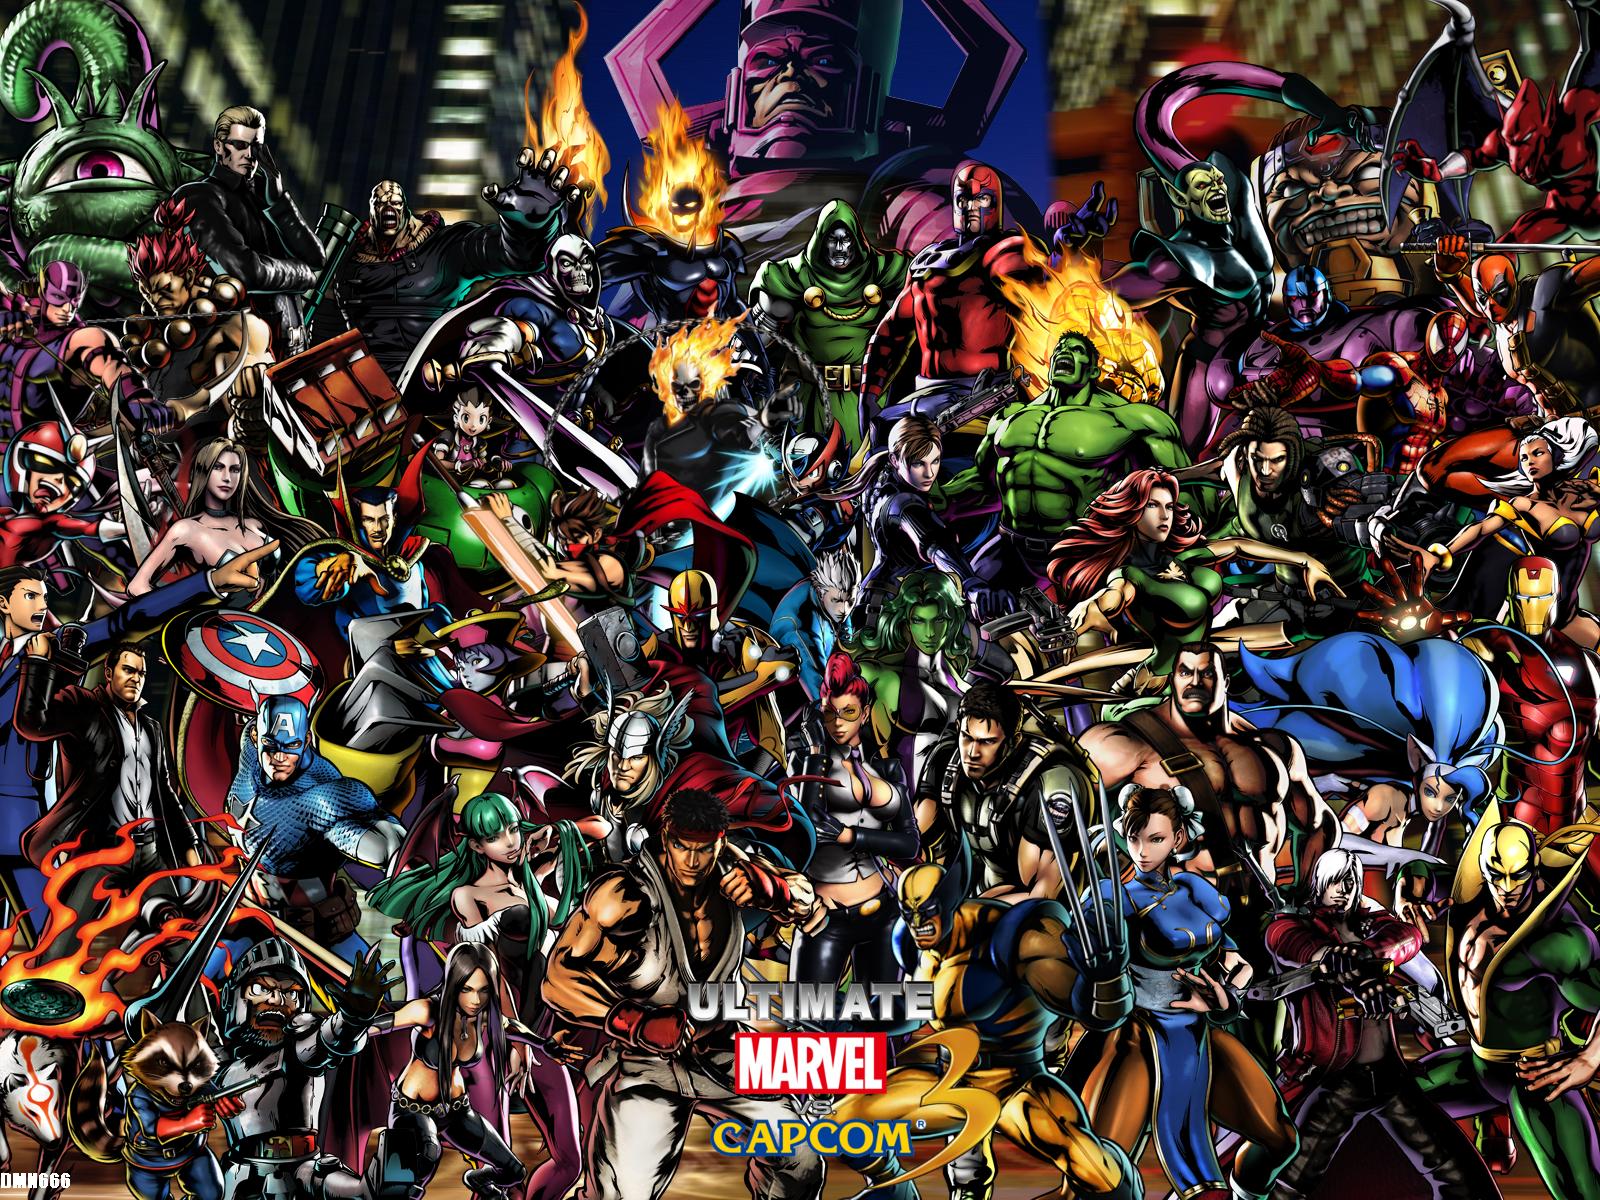 Ultimate Marvel vs. Capcom 3 - Method To Madness   1600 x 1200 png 4714kB